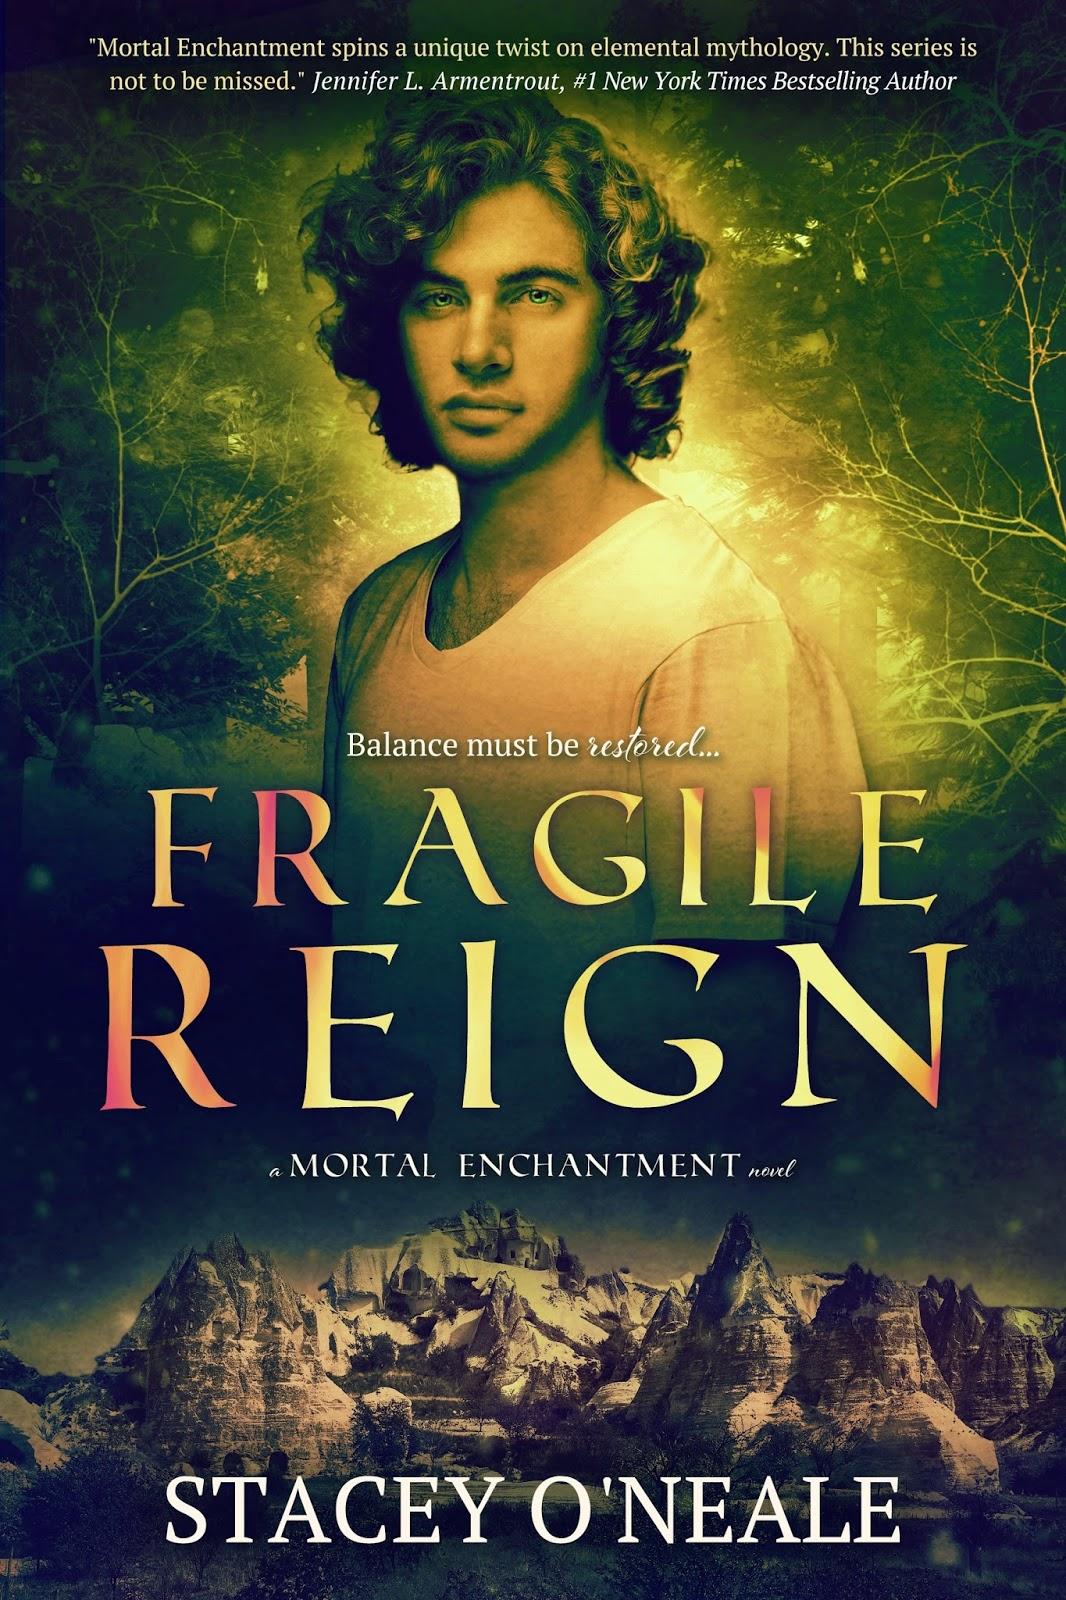 https://www.goodreads.com/book/show/21947629-fragile-reign